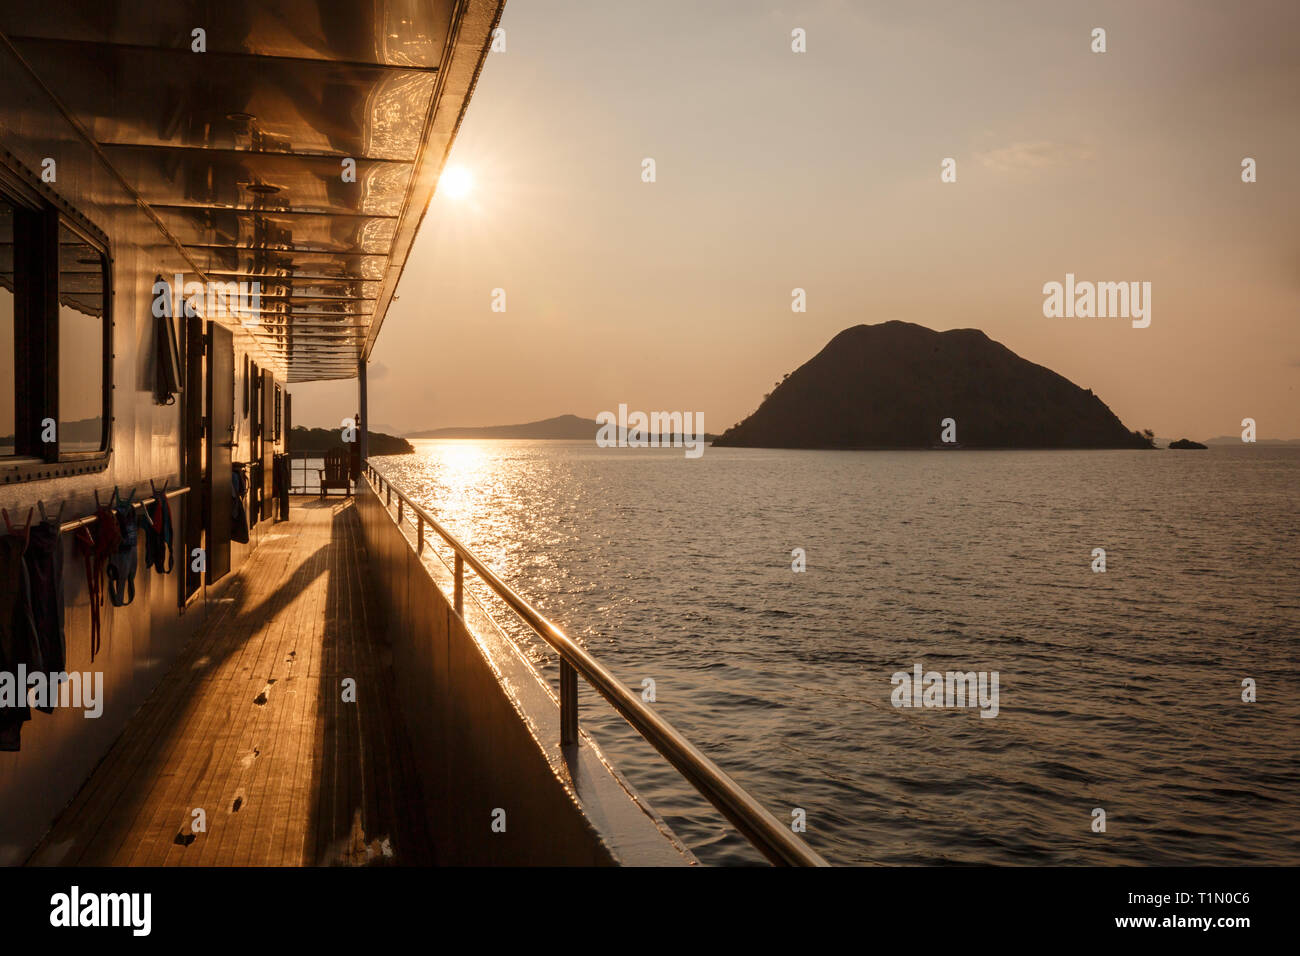 passengers taking ferry  to Komodo Island enjoy beautiful sunset on water - Stock Image